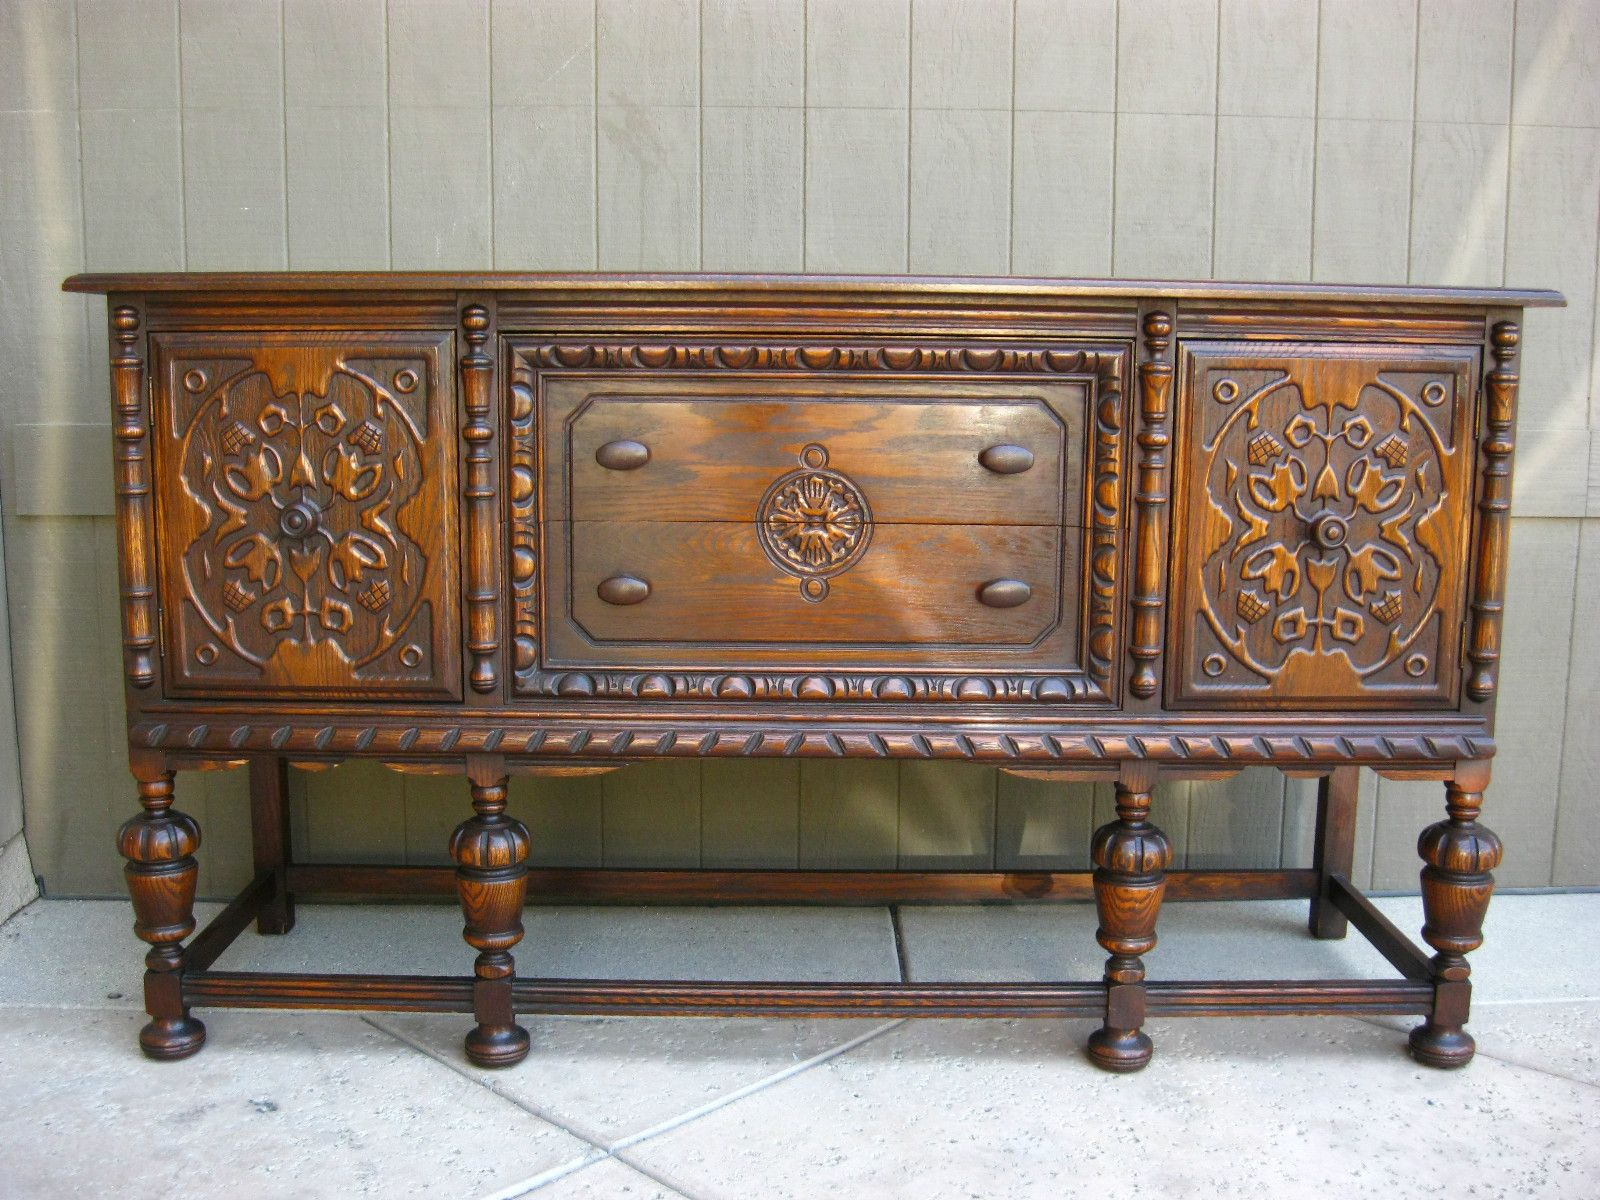 Vintage Spanish Revival Buffet Gorgeous Renaissance Carved Sideboard Credenza Ebay Fun Decor